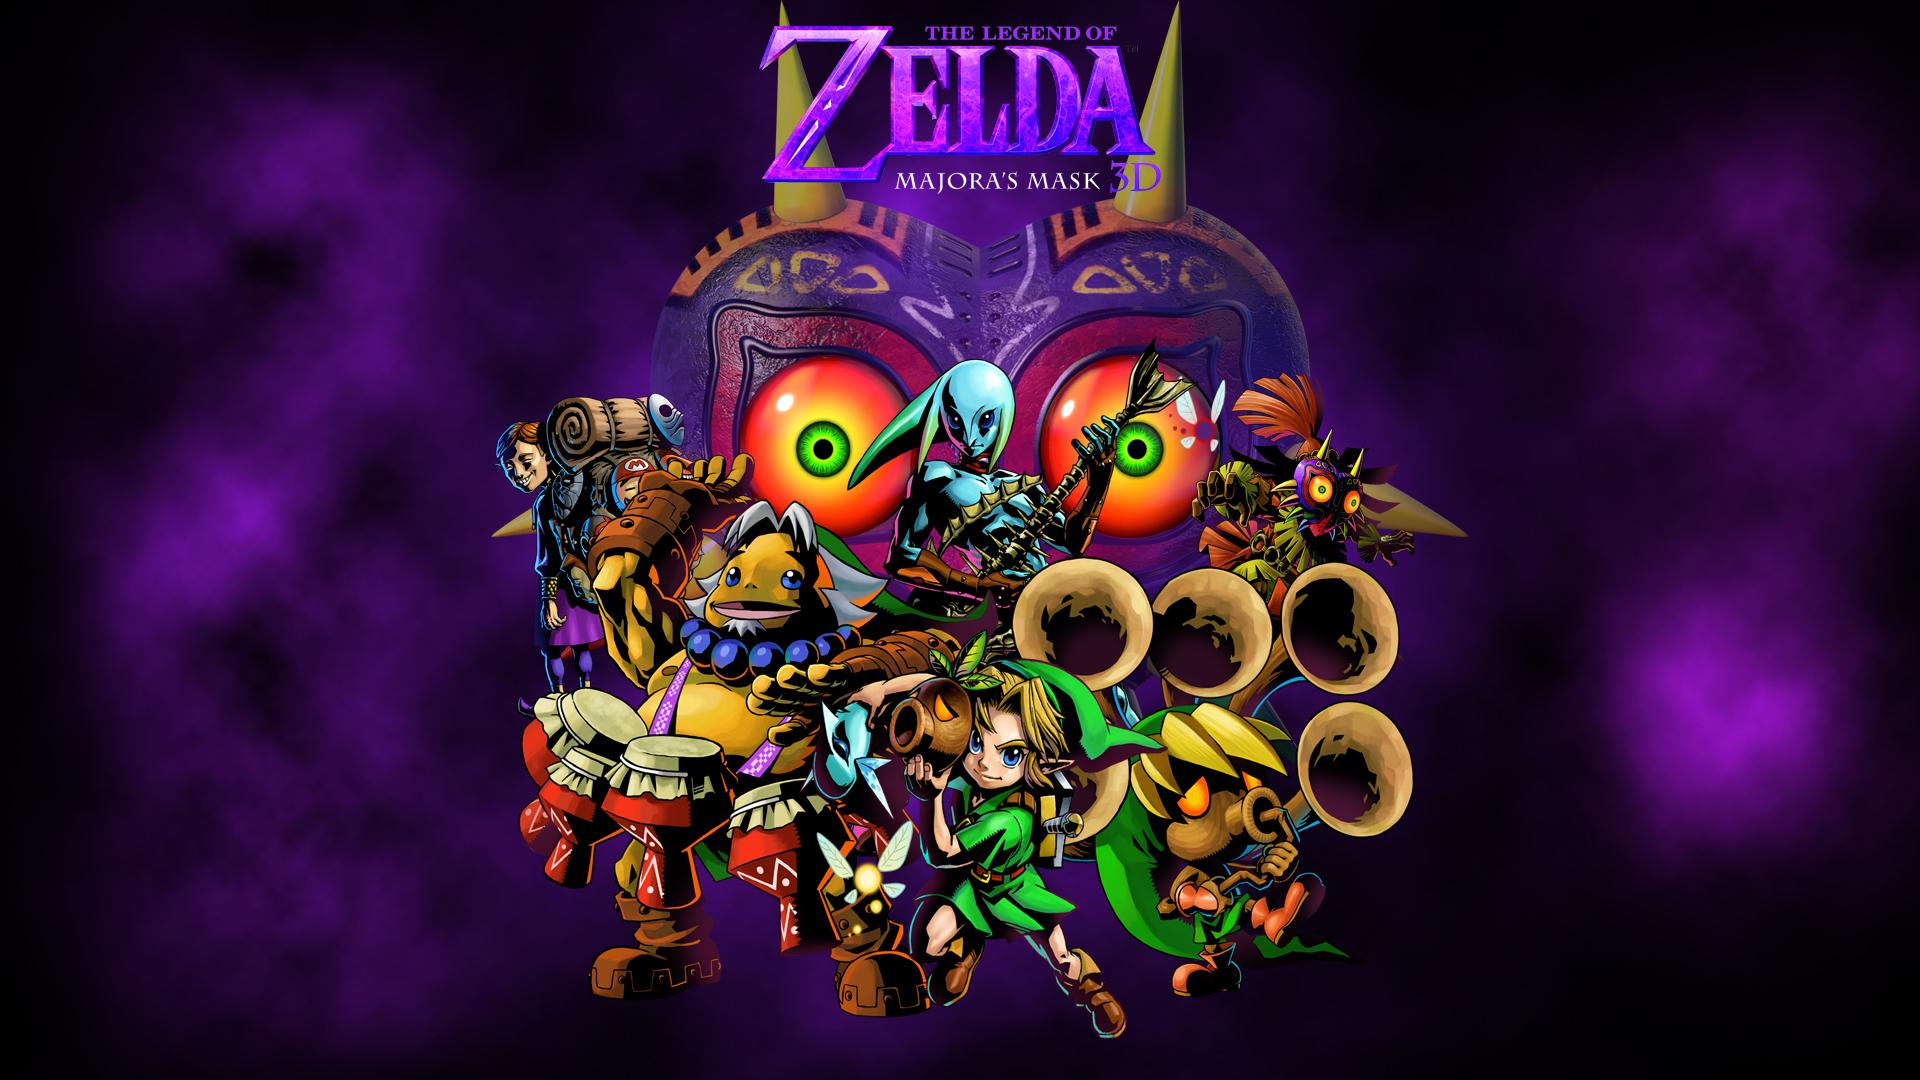 Zelda Majora's Mask 3ds wallpaper by zupertompa on DeviantArt